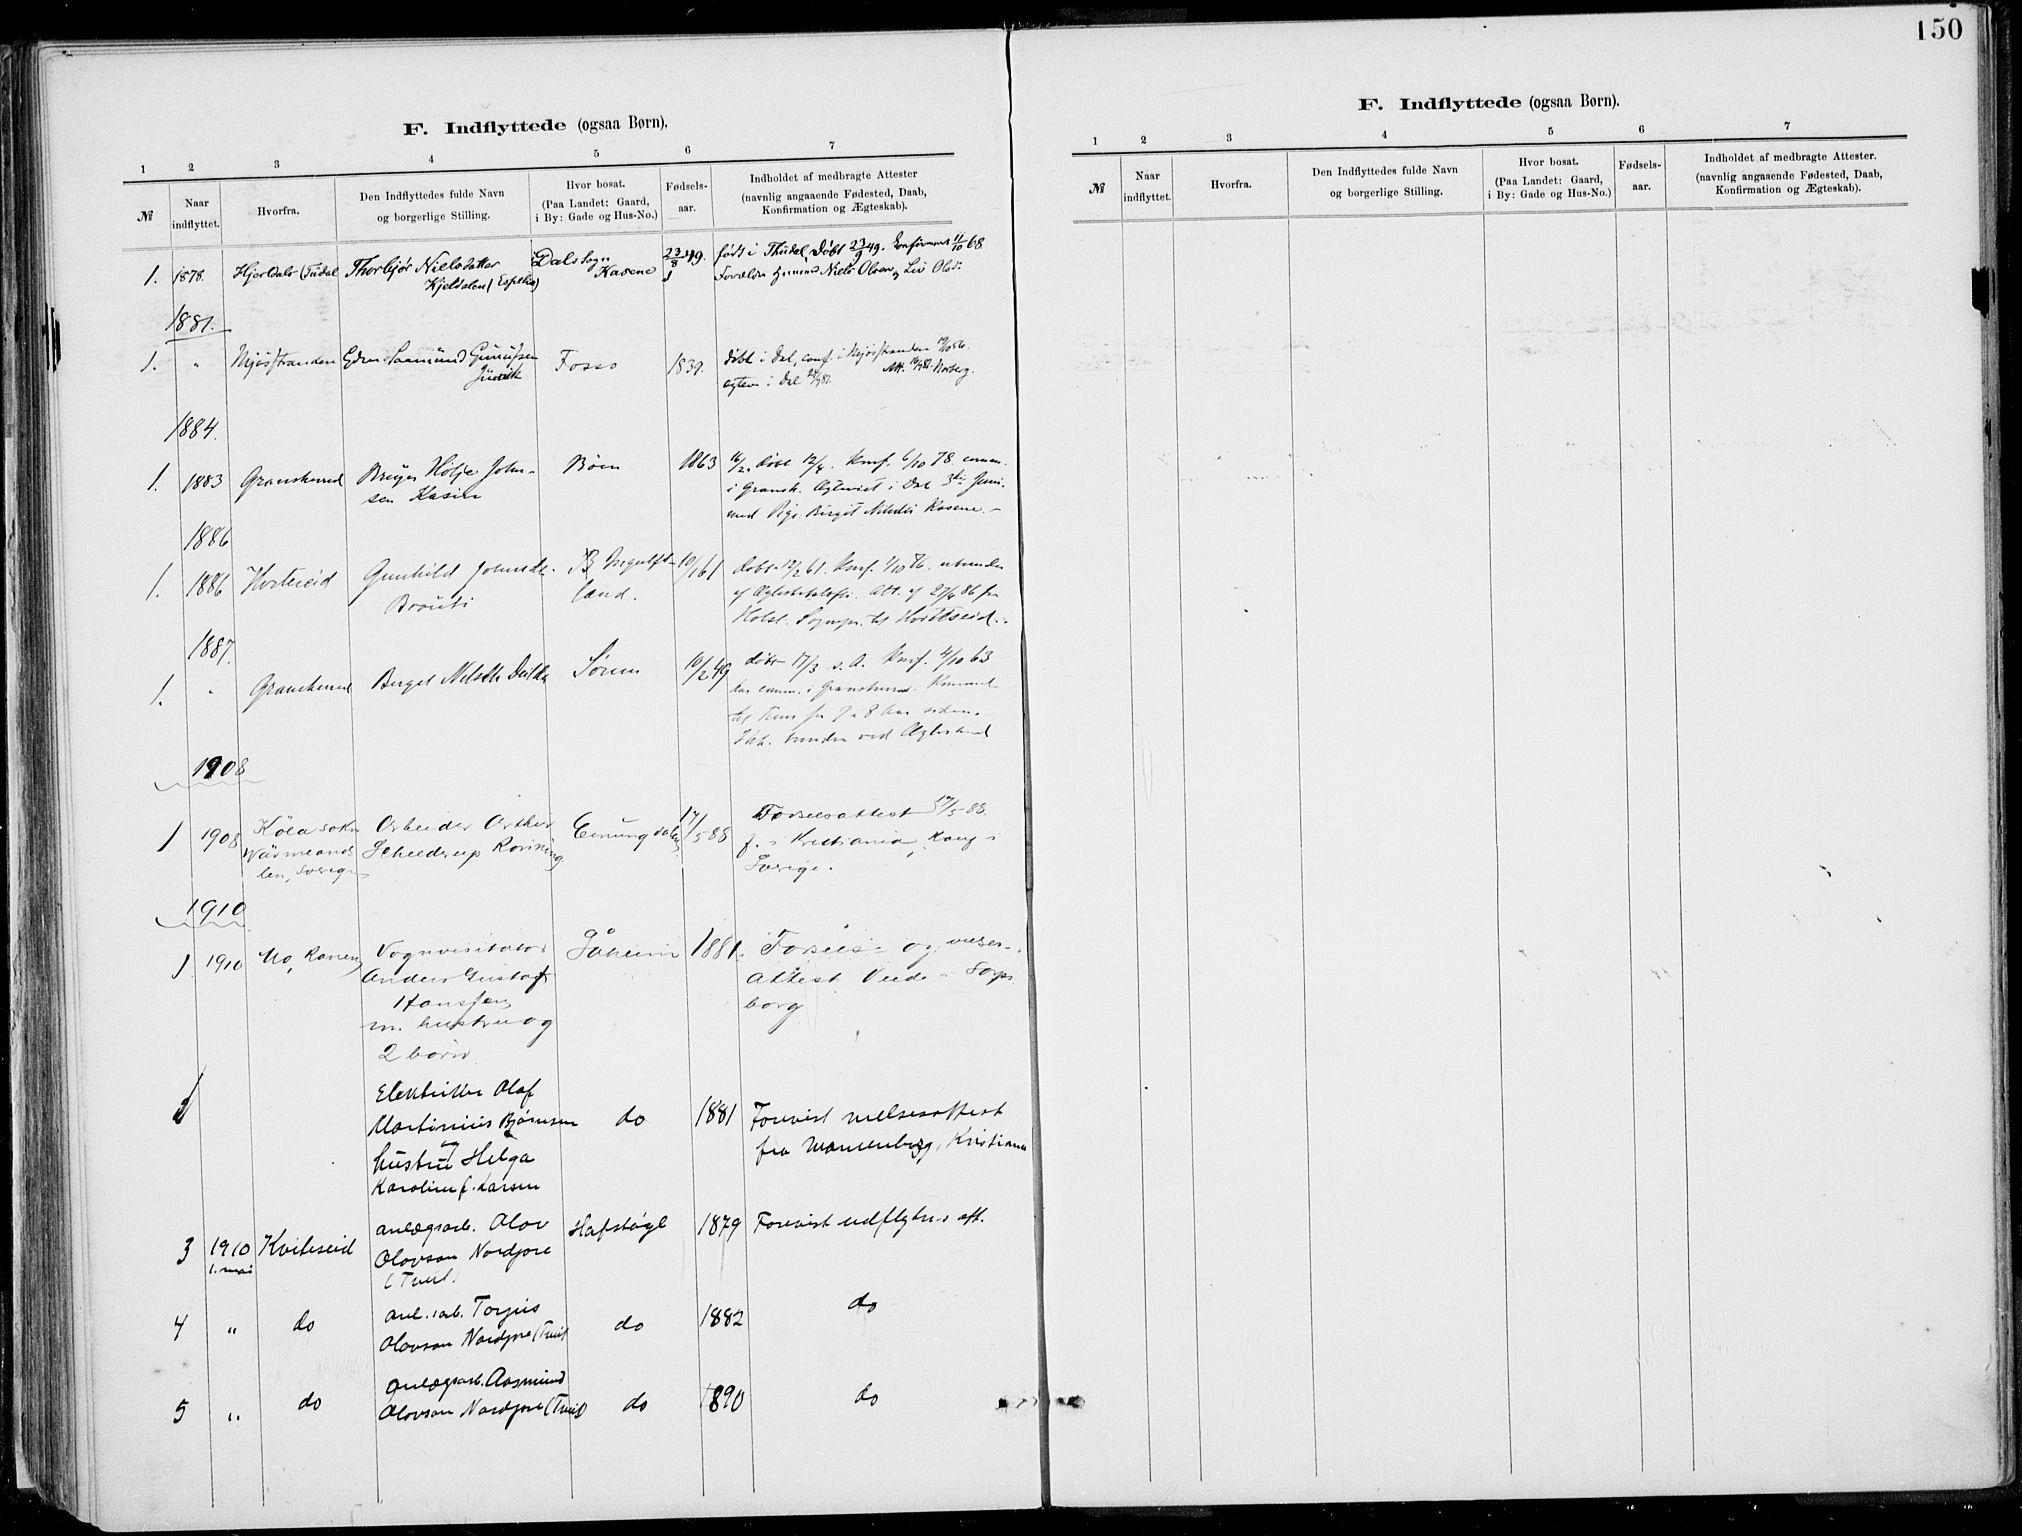 SAKO, Rjukan kirkebøker, F/Fa/L0001: Ministerialbok nr. 1, 1878-1912, s. 150